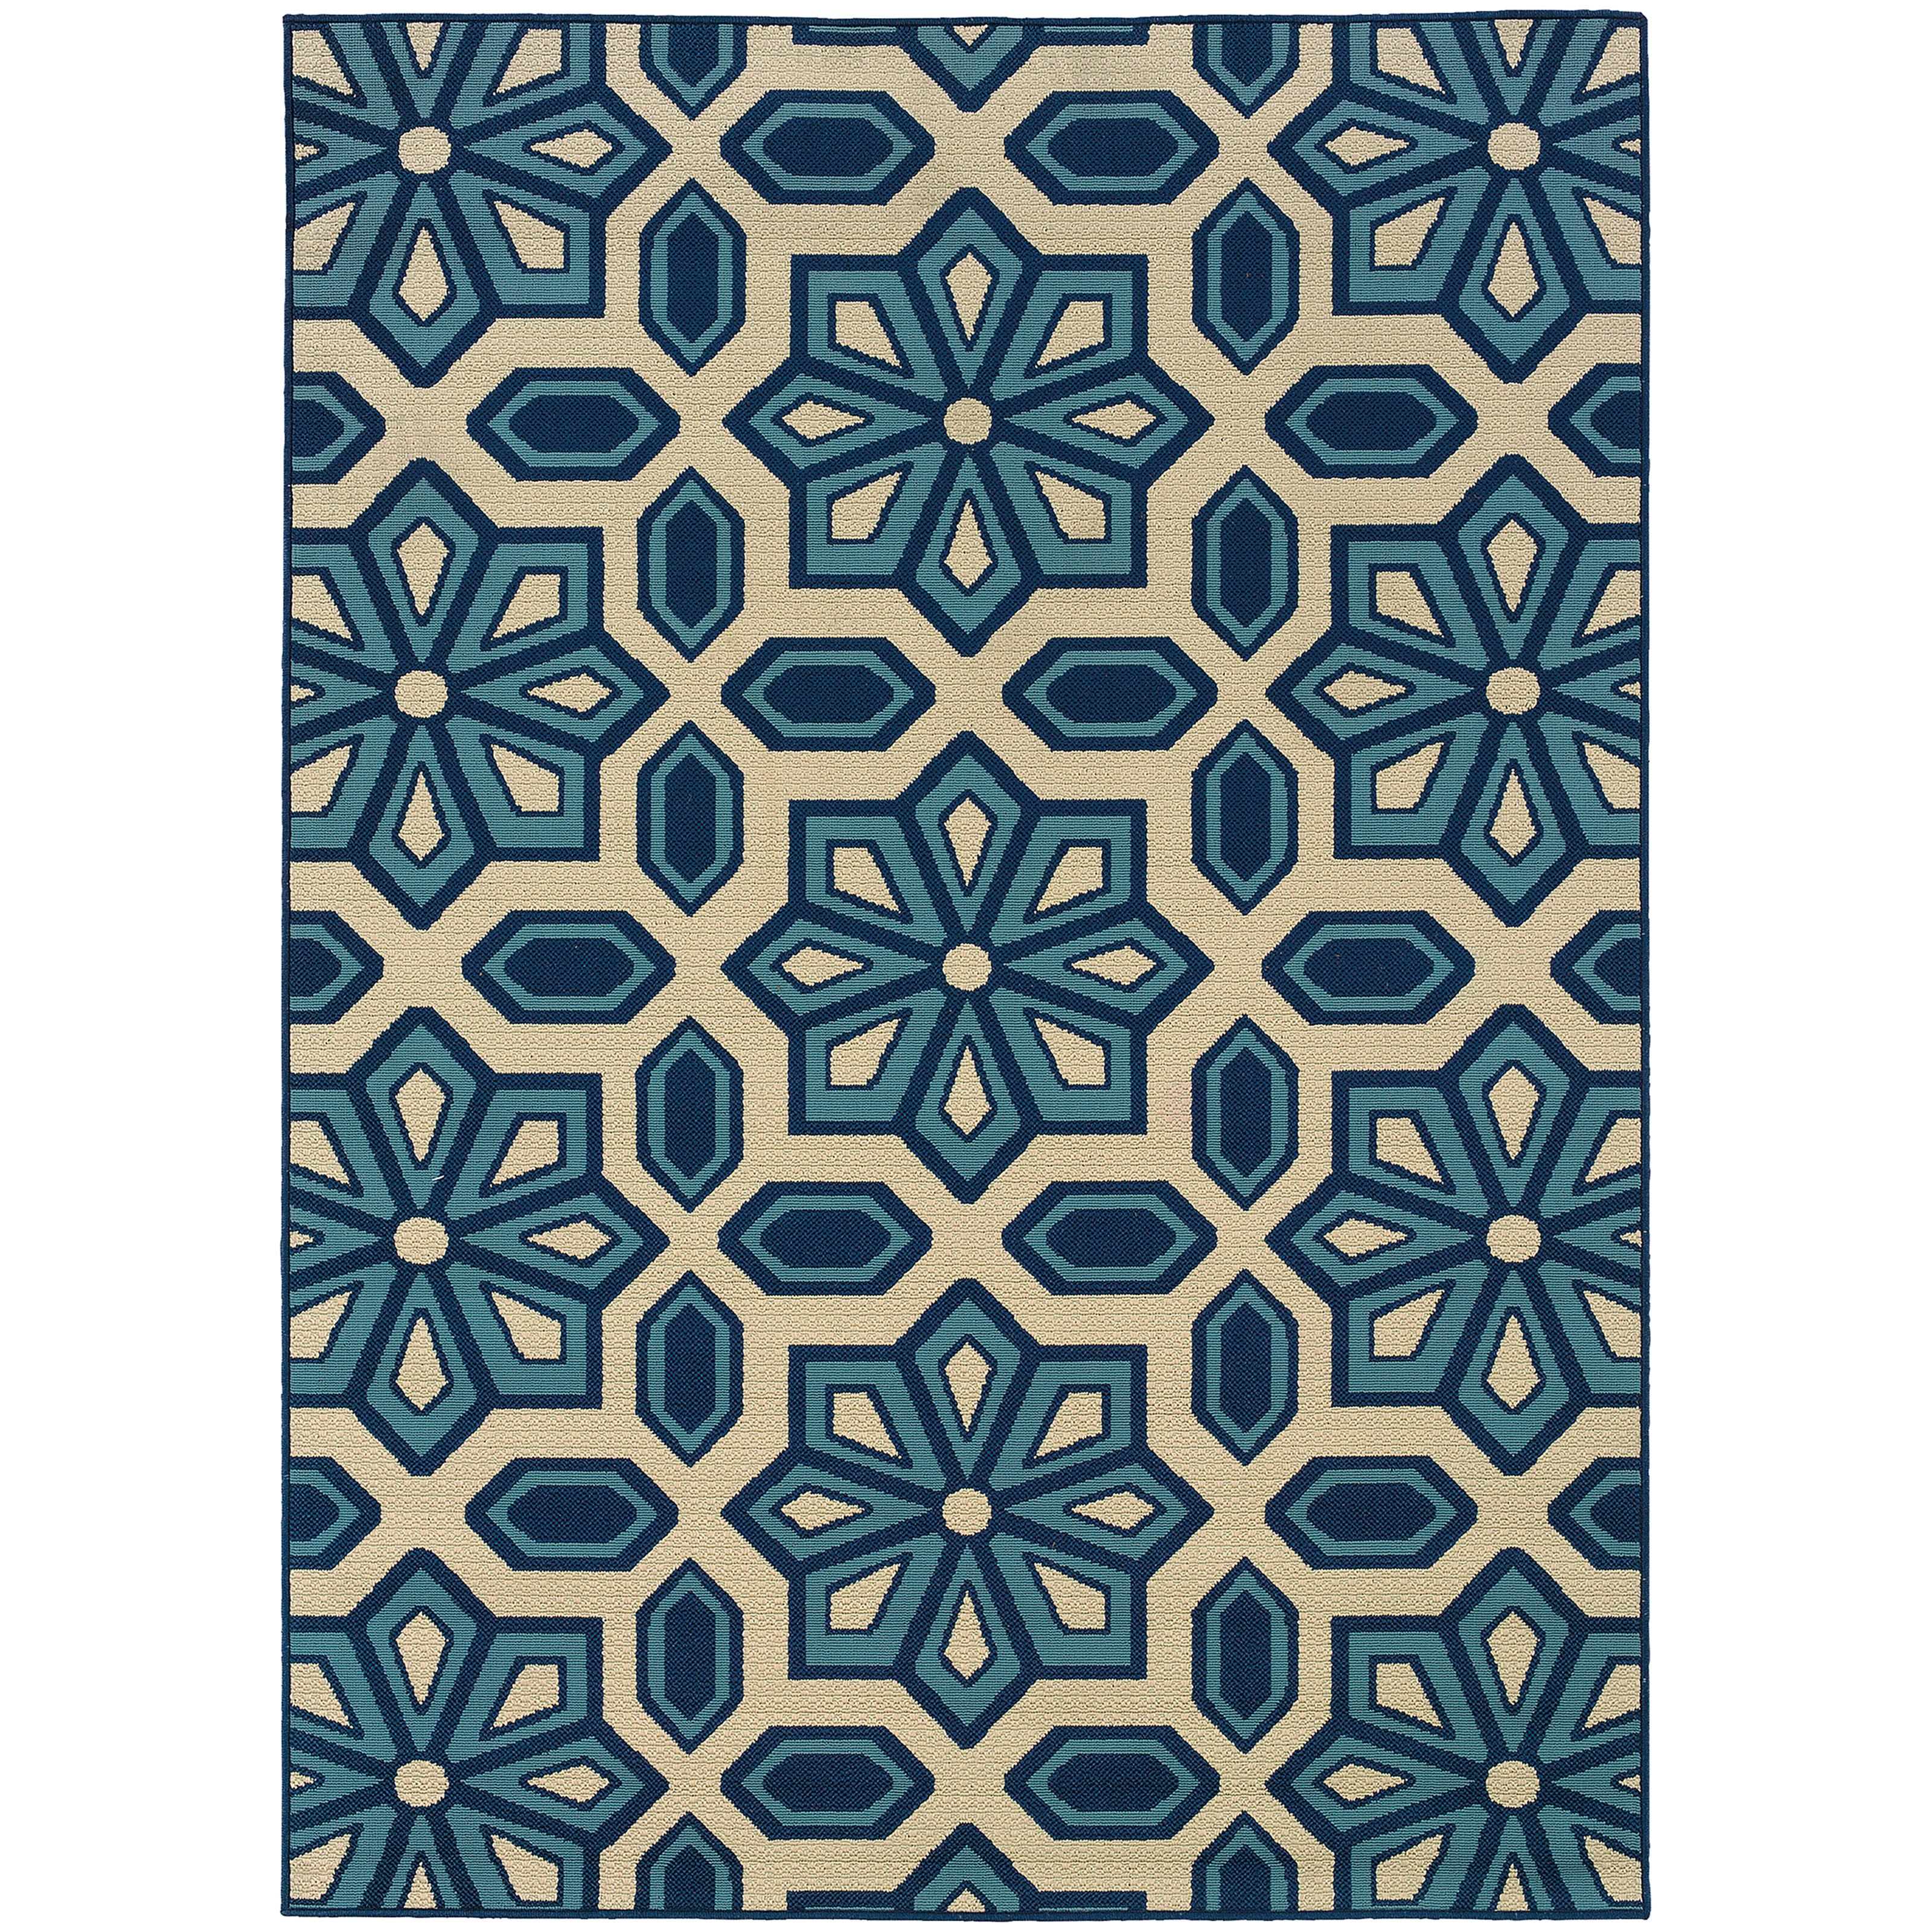 "Caspian 7'10"" X 10'10"" Rug by Oriental Weavers at Darvin Furniture"